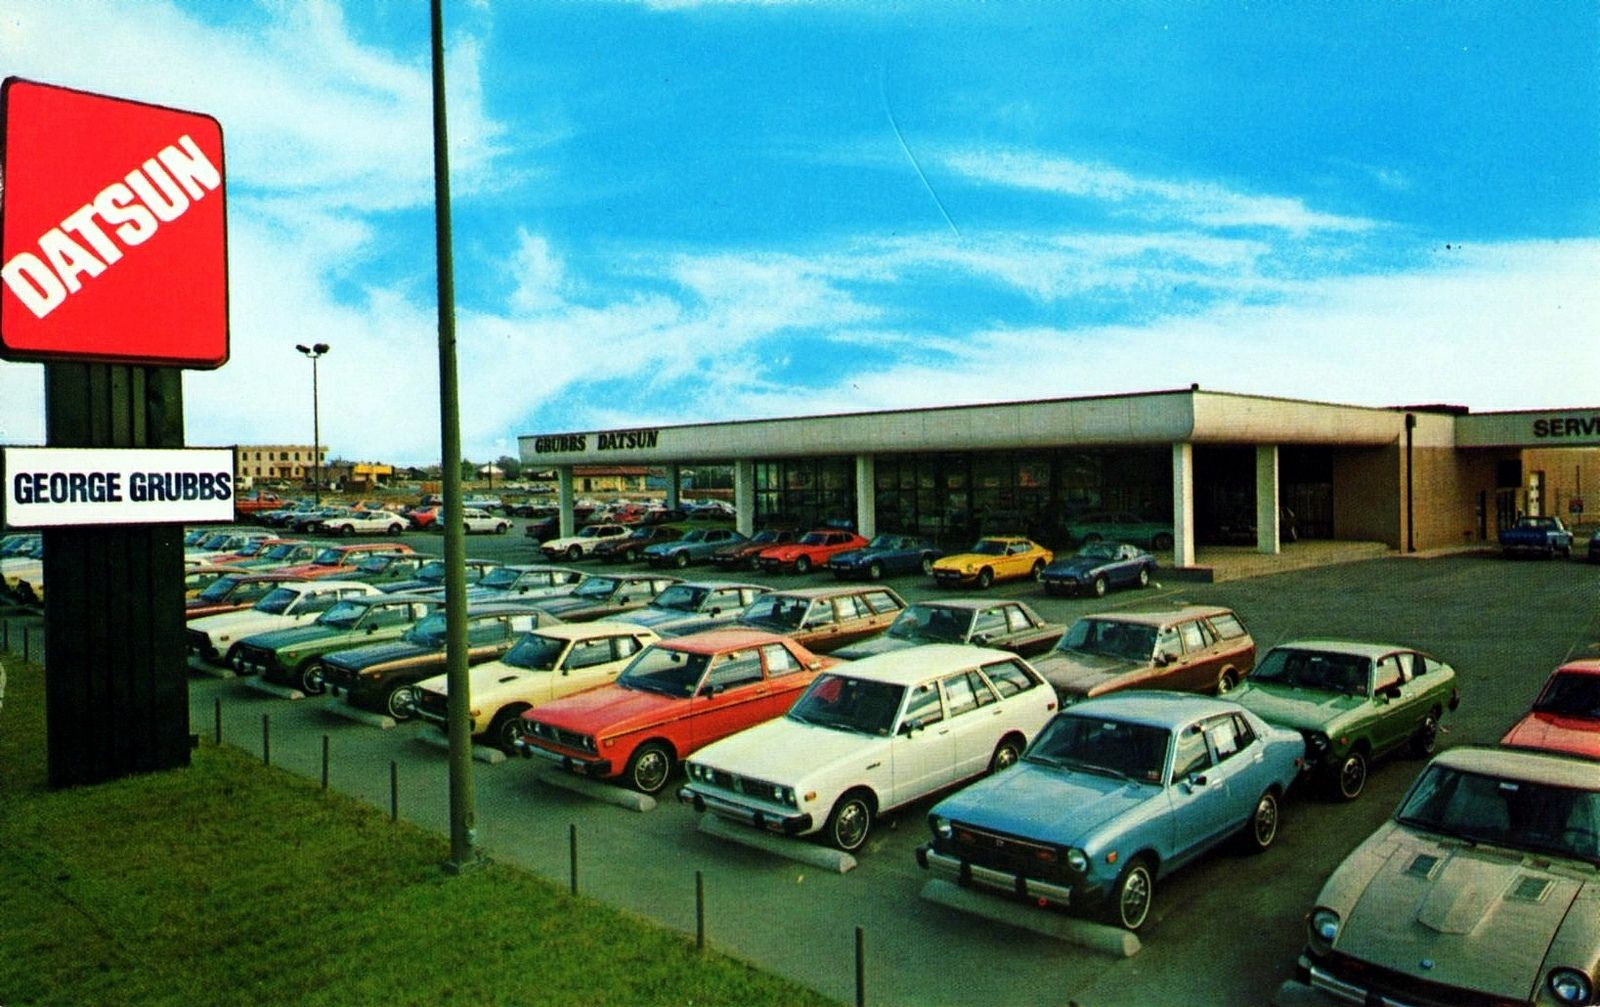 1970 S George Grubbs Datsun Dealership Bedford Texas Datsun Nissan Z Cars Nissan Infiniti